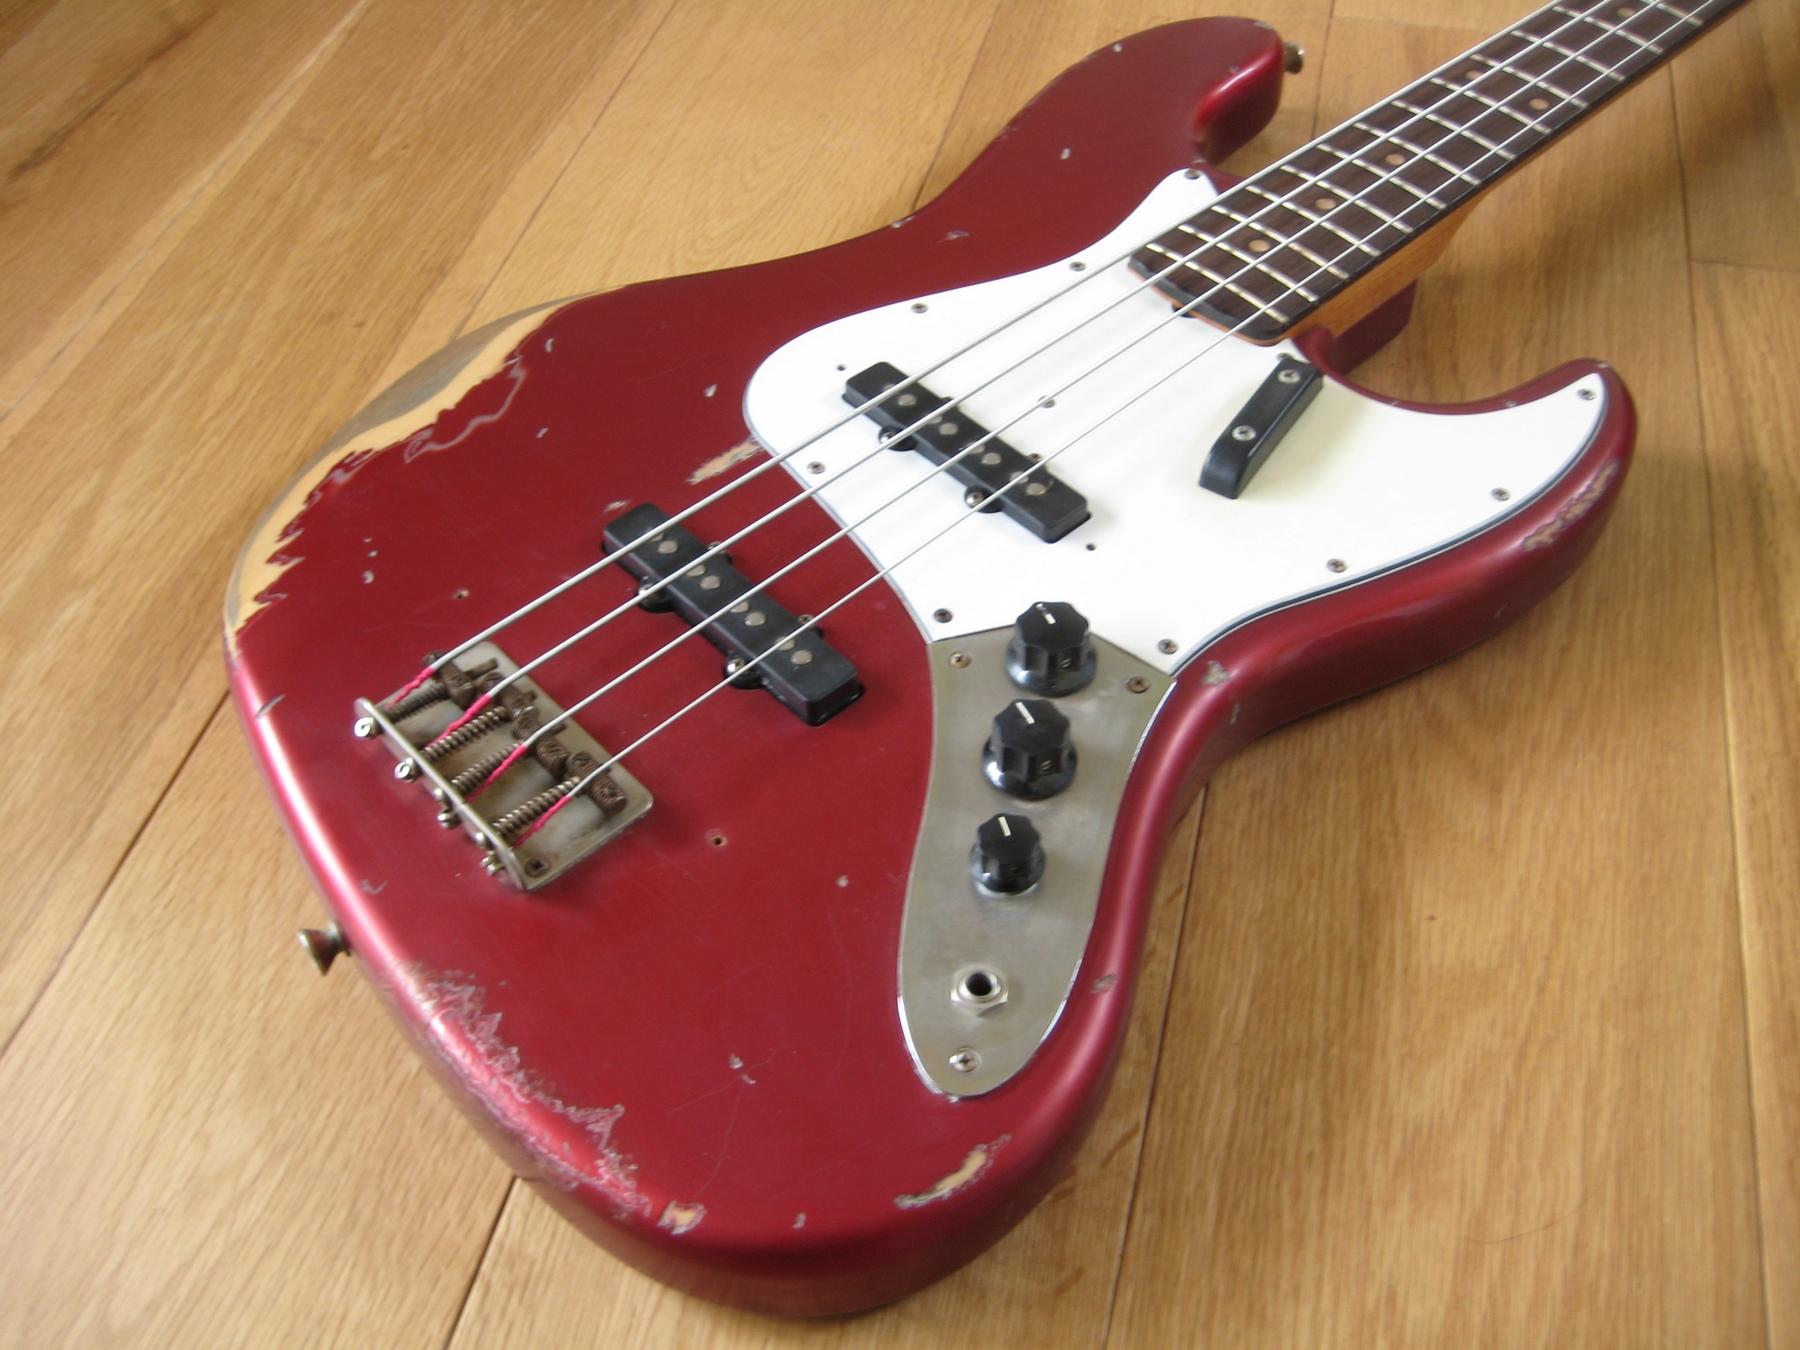 limelight j bass 00112 classic cool guitars. Black Bedroom Furniture Sets. Home Design Ideas